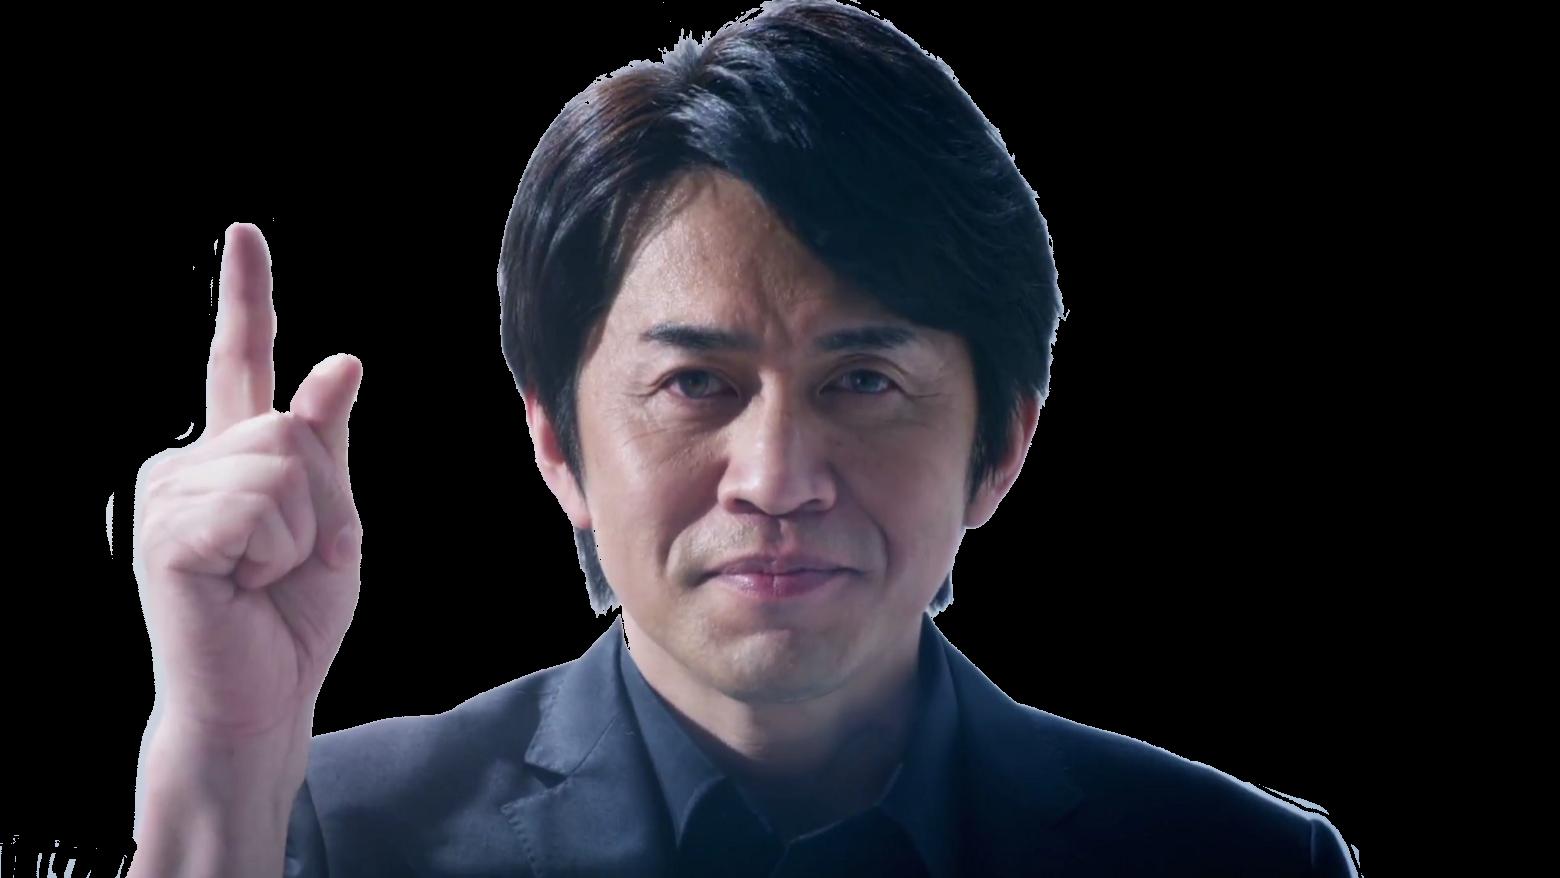 Sticker risitas yoshiaki koizumi nintendo switch doigt leve zelda majoras mask super mario 64 protege de miyamoto